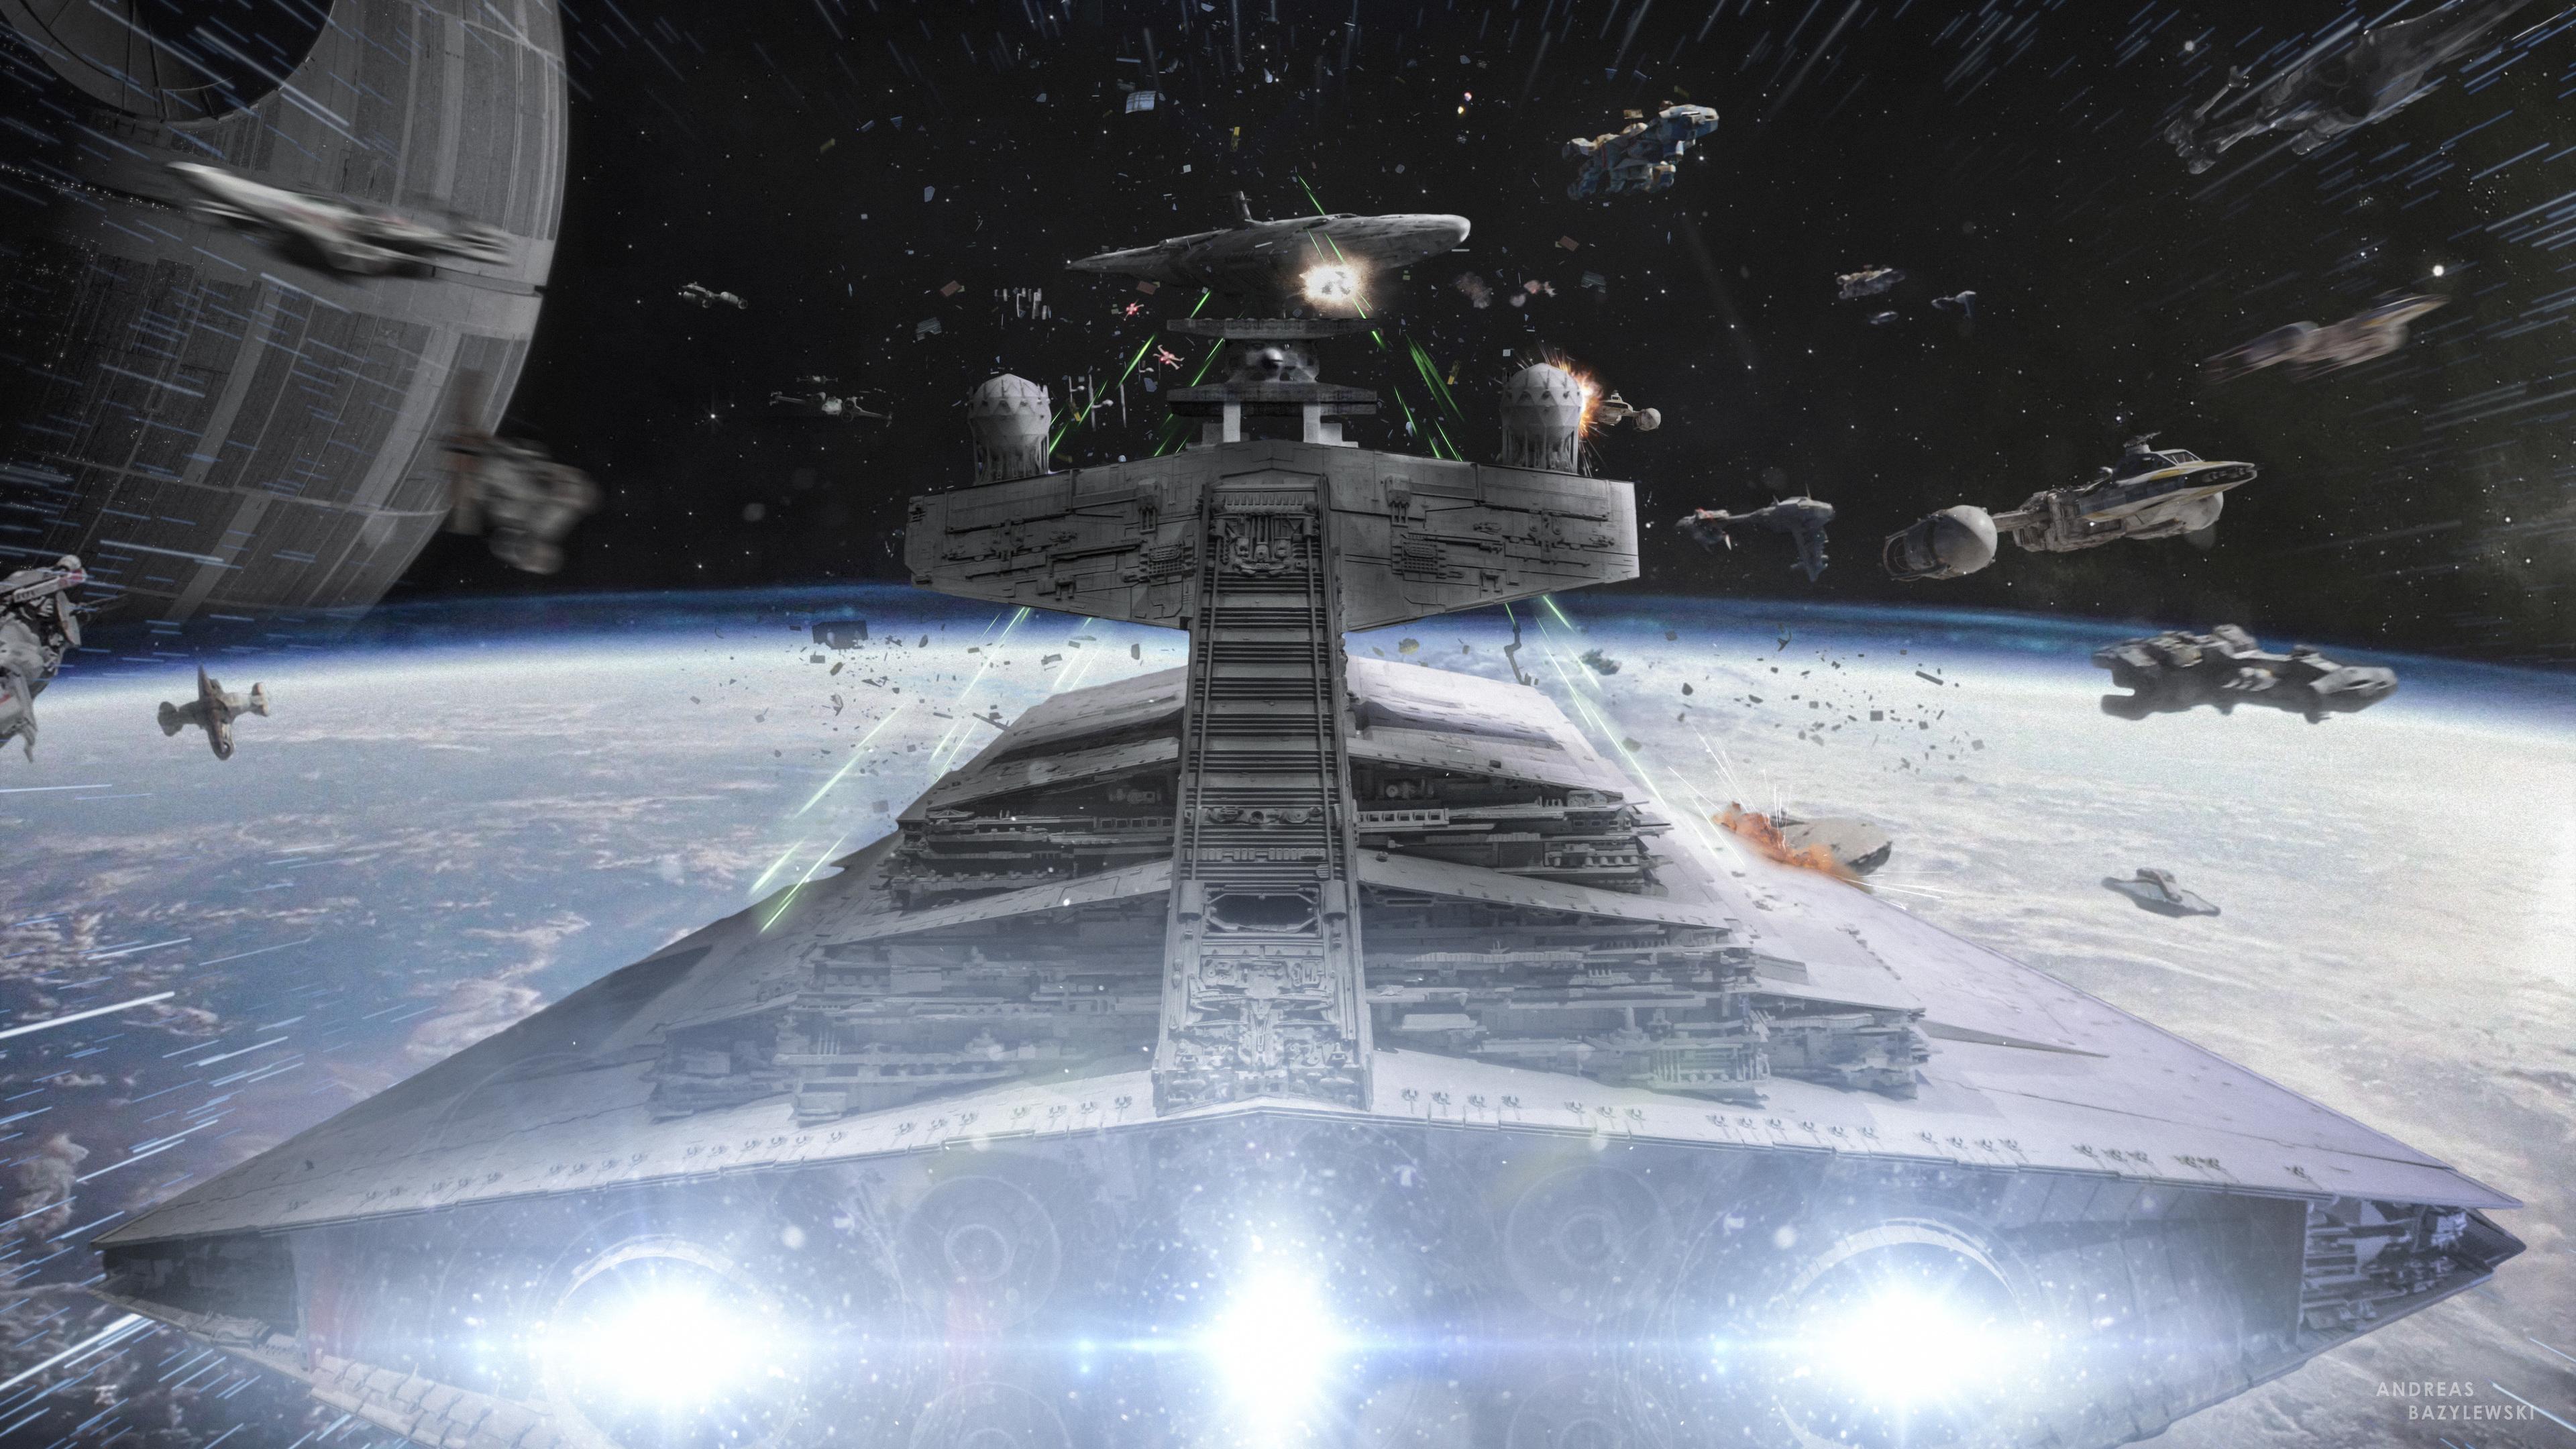 star wars devastator ship 4k 1540754818 - Star Wars Devastator Ship 4k - star wars wallpapers, hd-wallpapers, digital art wallpapers, deviantart wallpapers, artwork wallpapers, artist wallpapers, 8k wallpapers, 5k wallpapers, 4k-wallpapers, 10k wallpapers